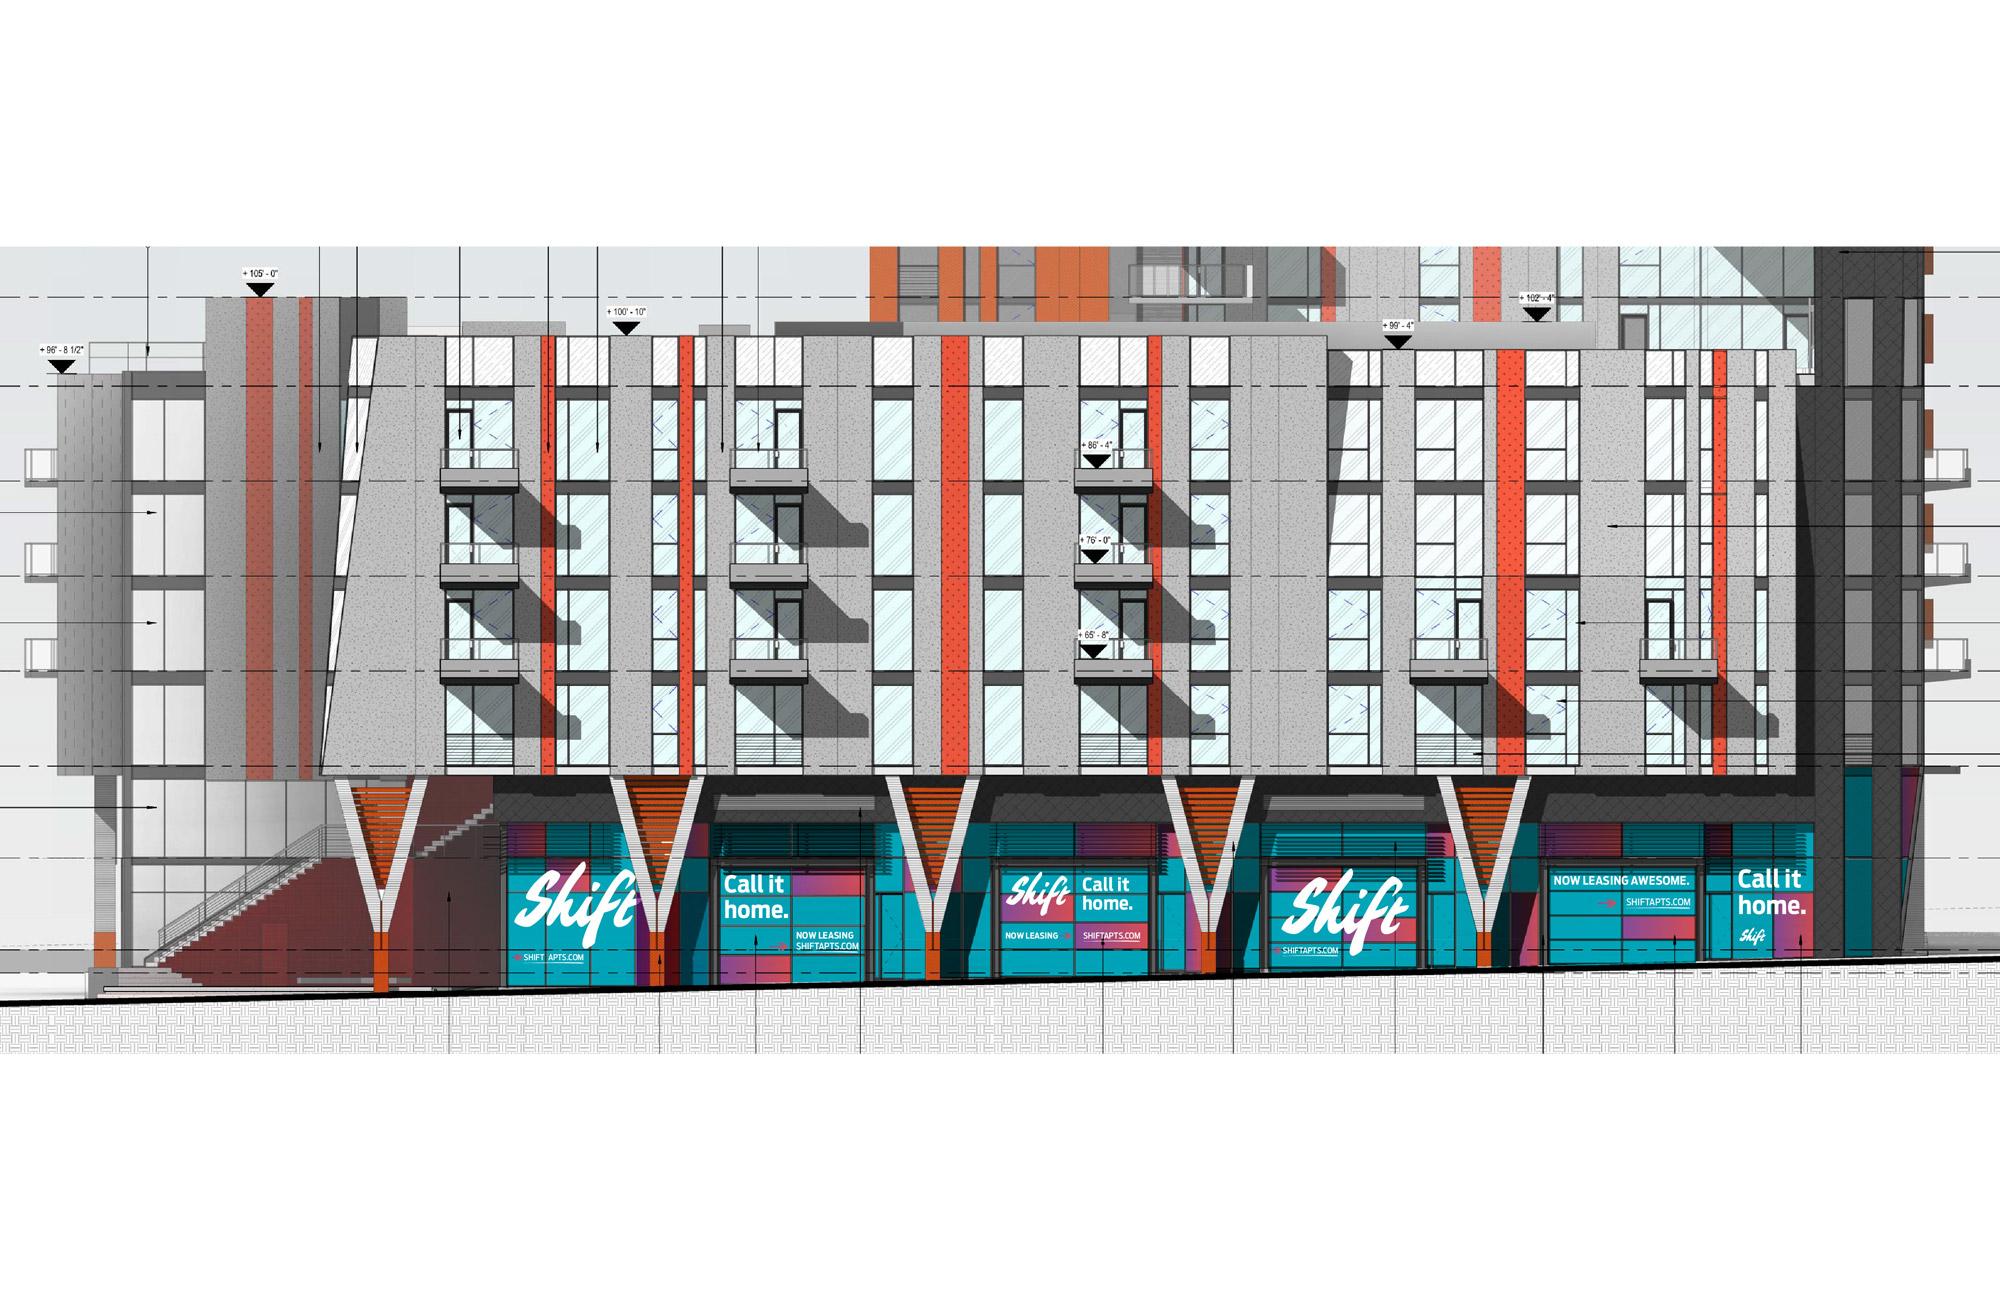 miriello-grafico_SHIFT-San-Diego-East-Village-Downtown-apartment-branding-08.jpg